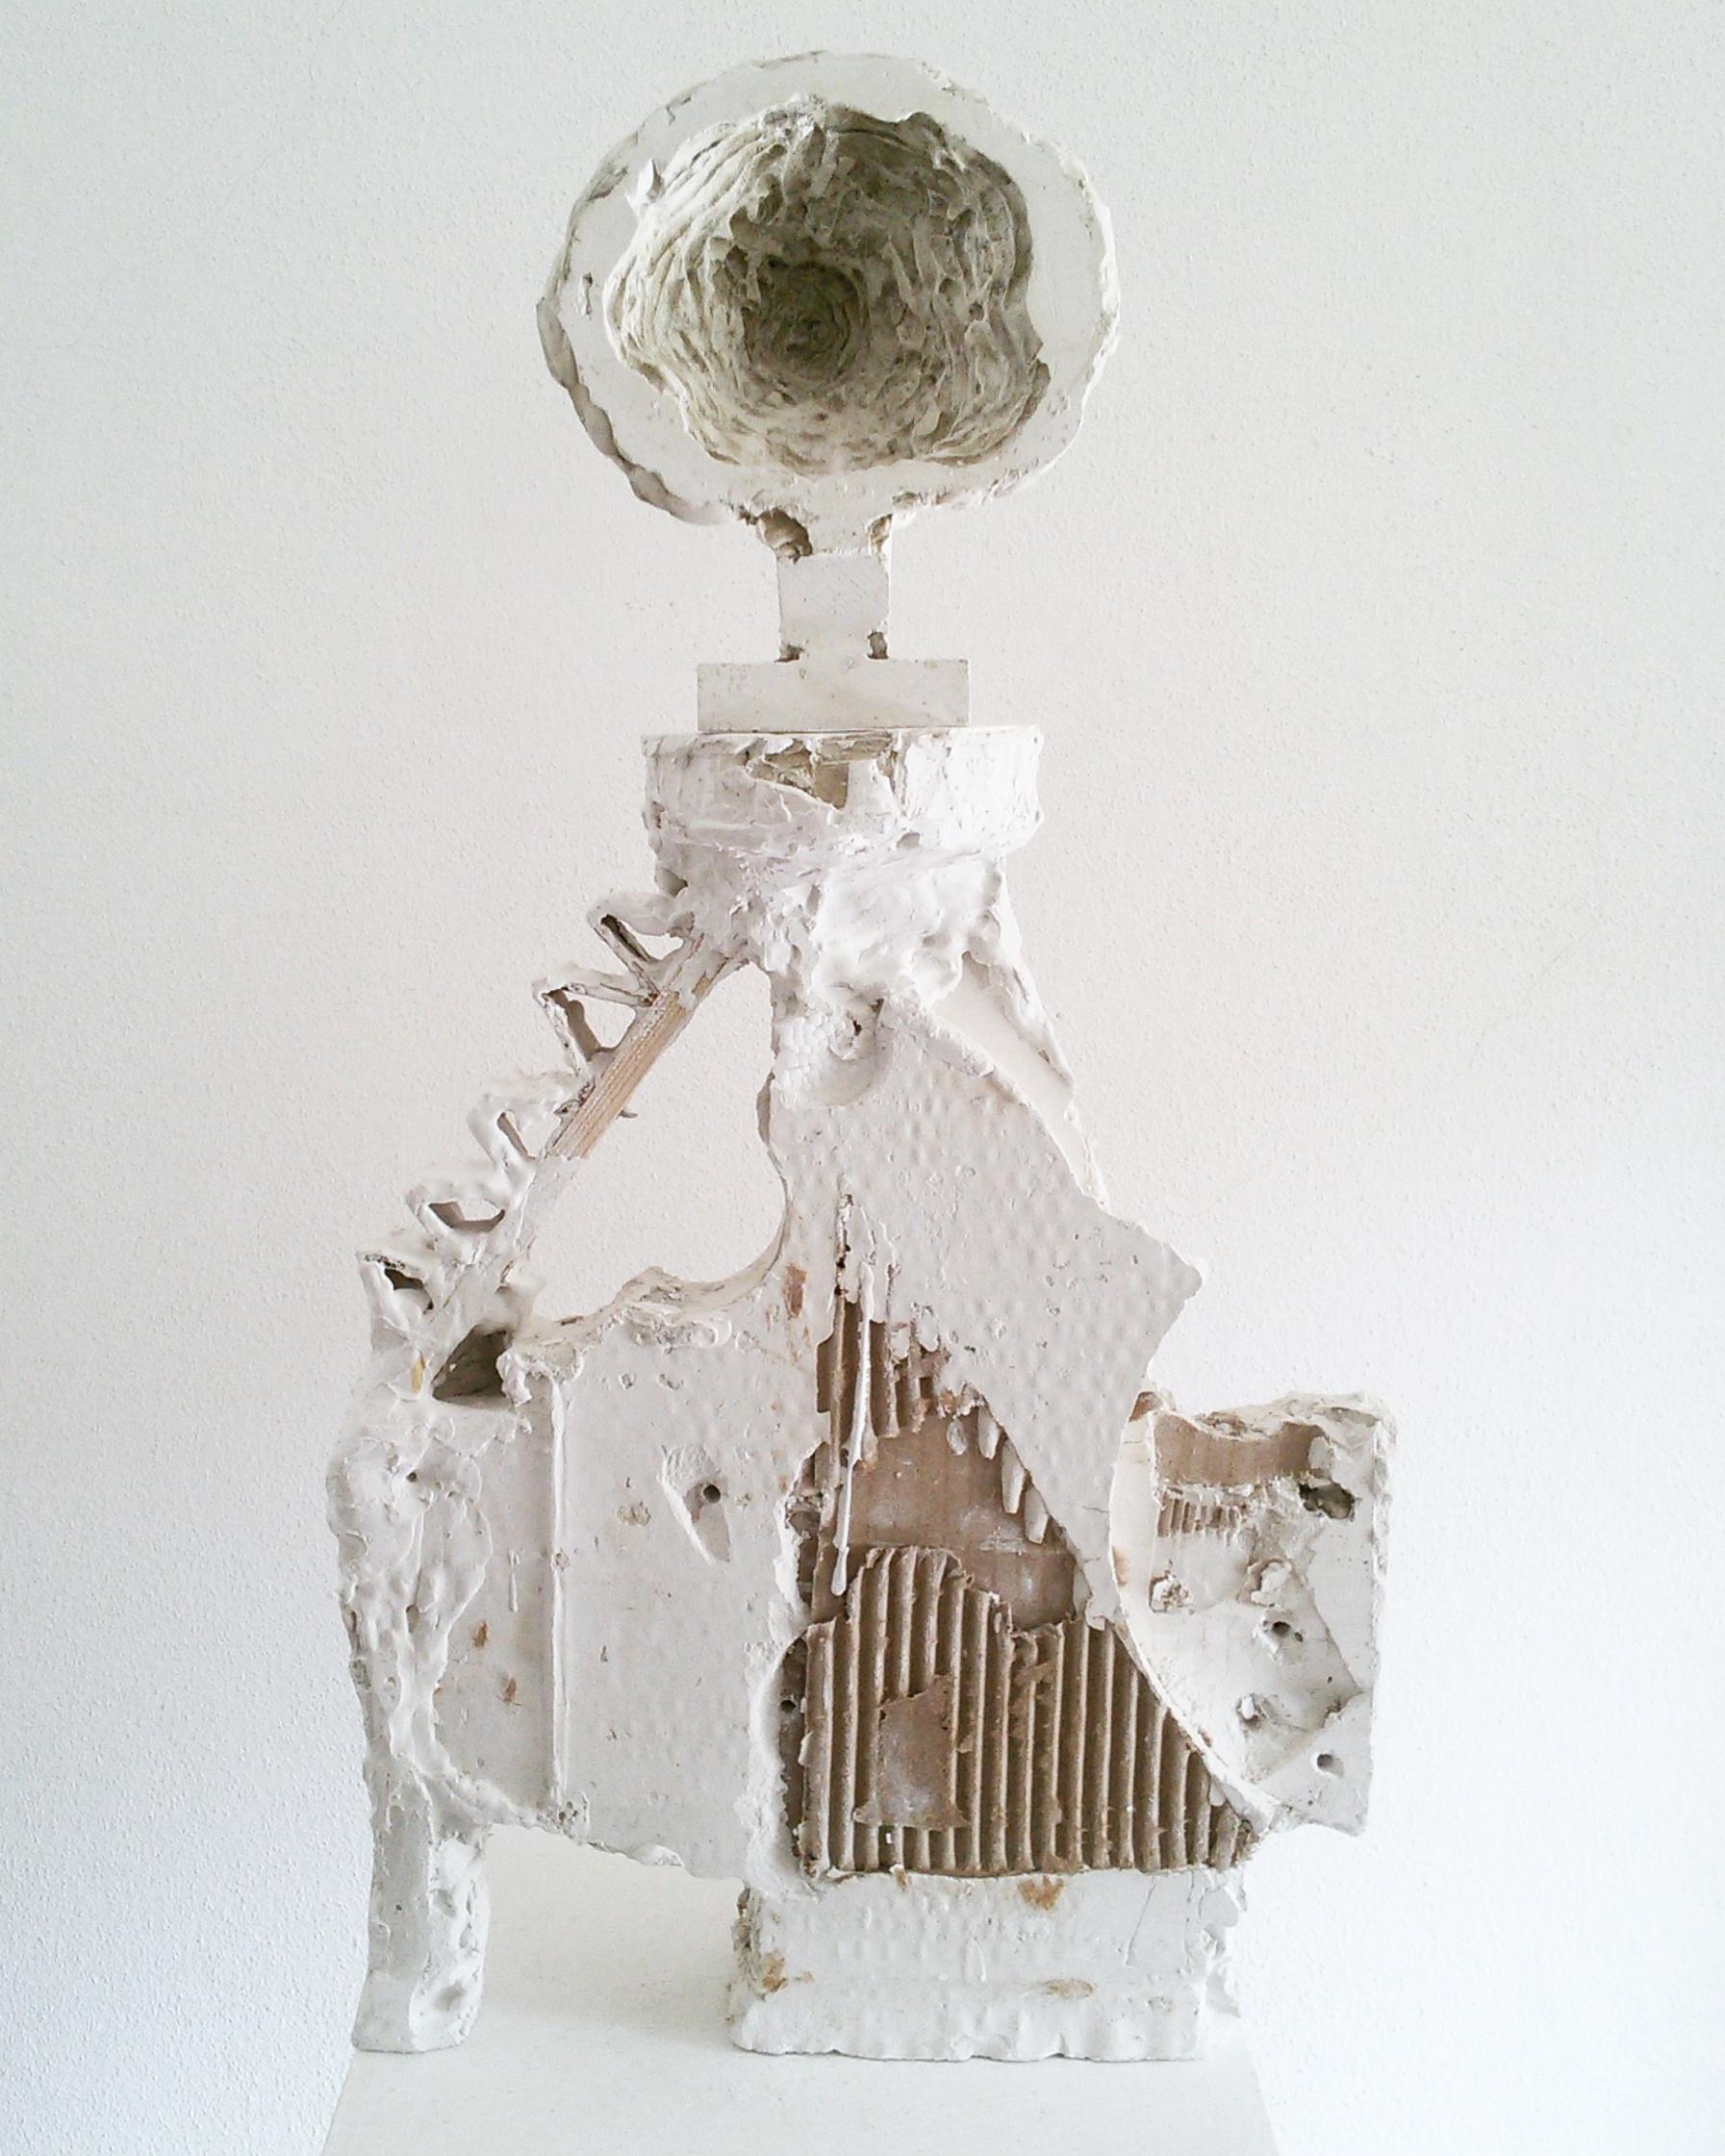 Siro Cugusi plaster sculpture (1).jpg